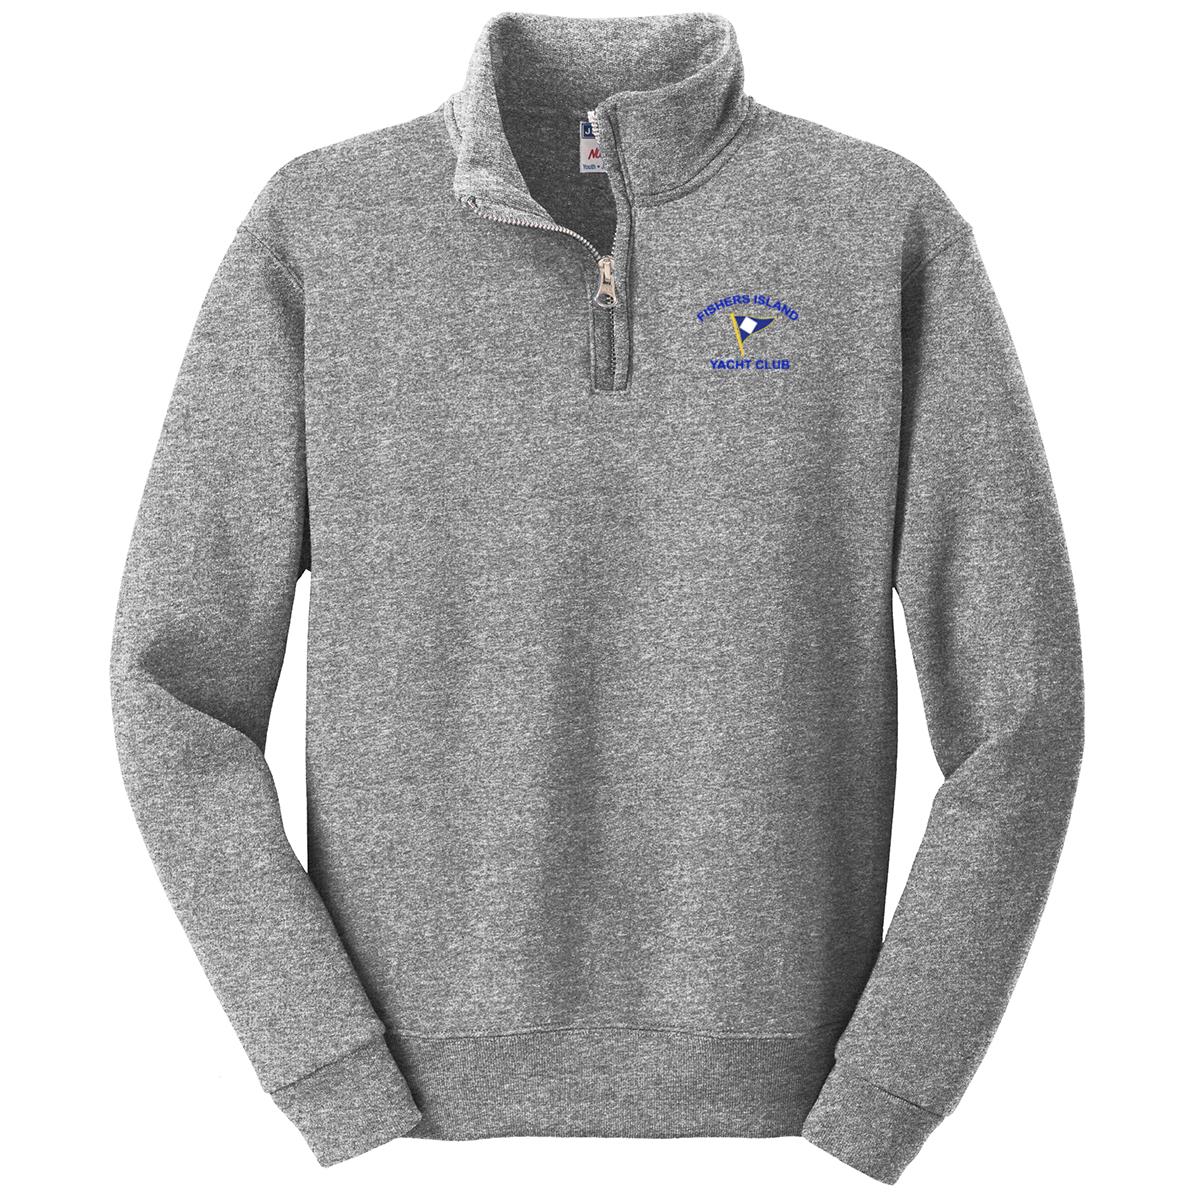 Fishers Island Yacht Club - Youth 1/4 Zip Sweatshirt